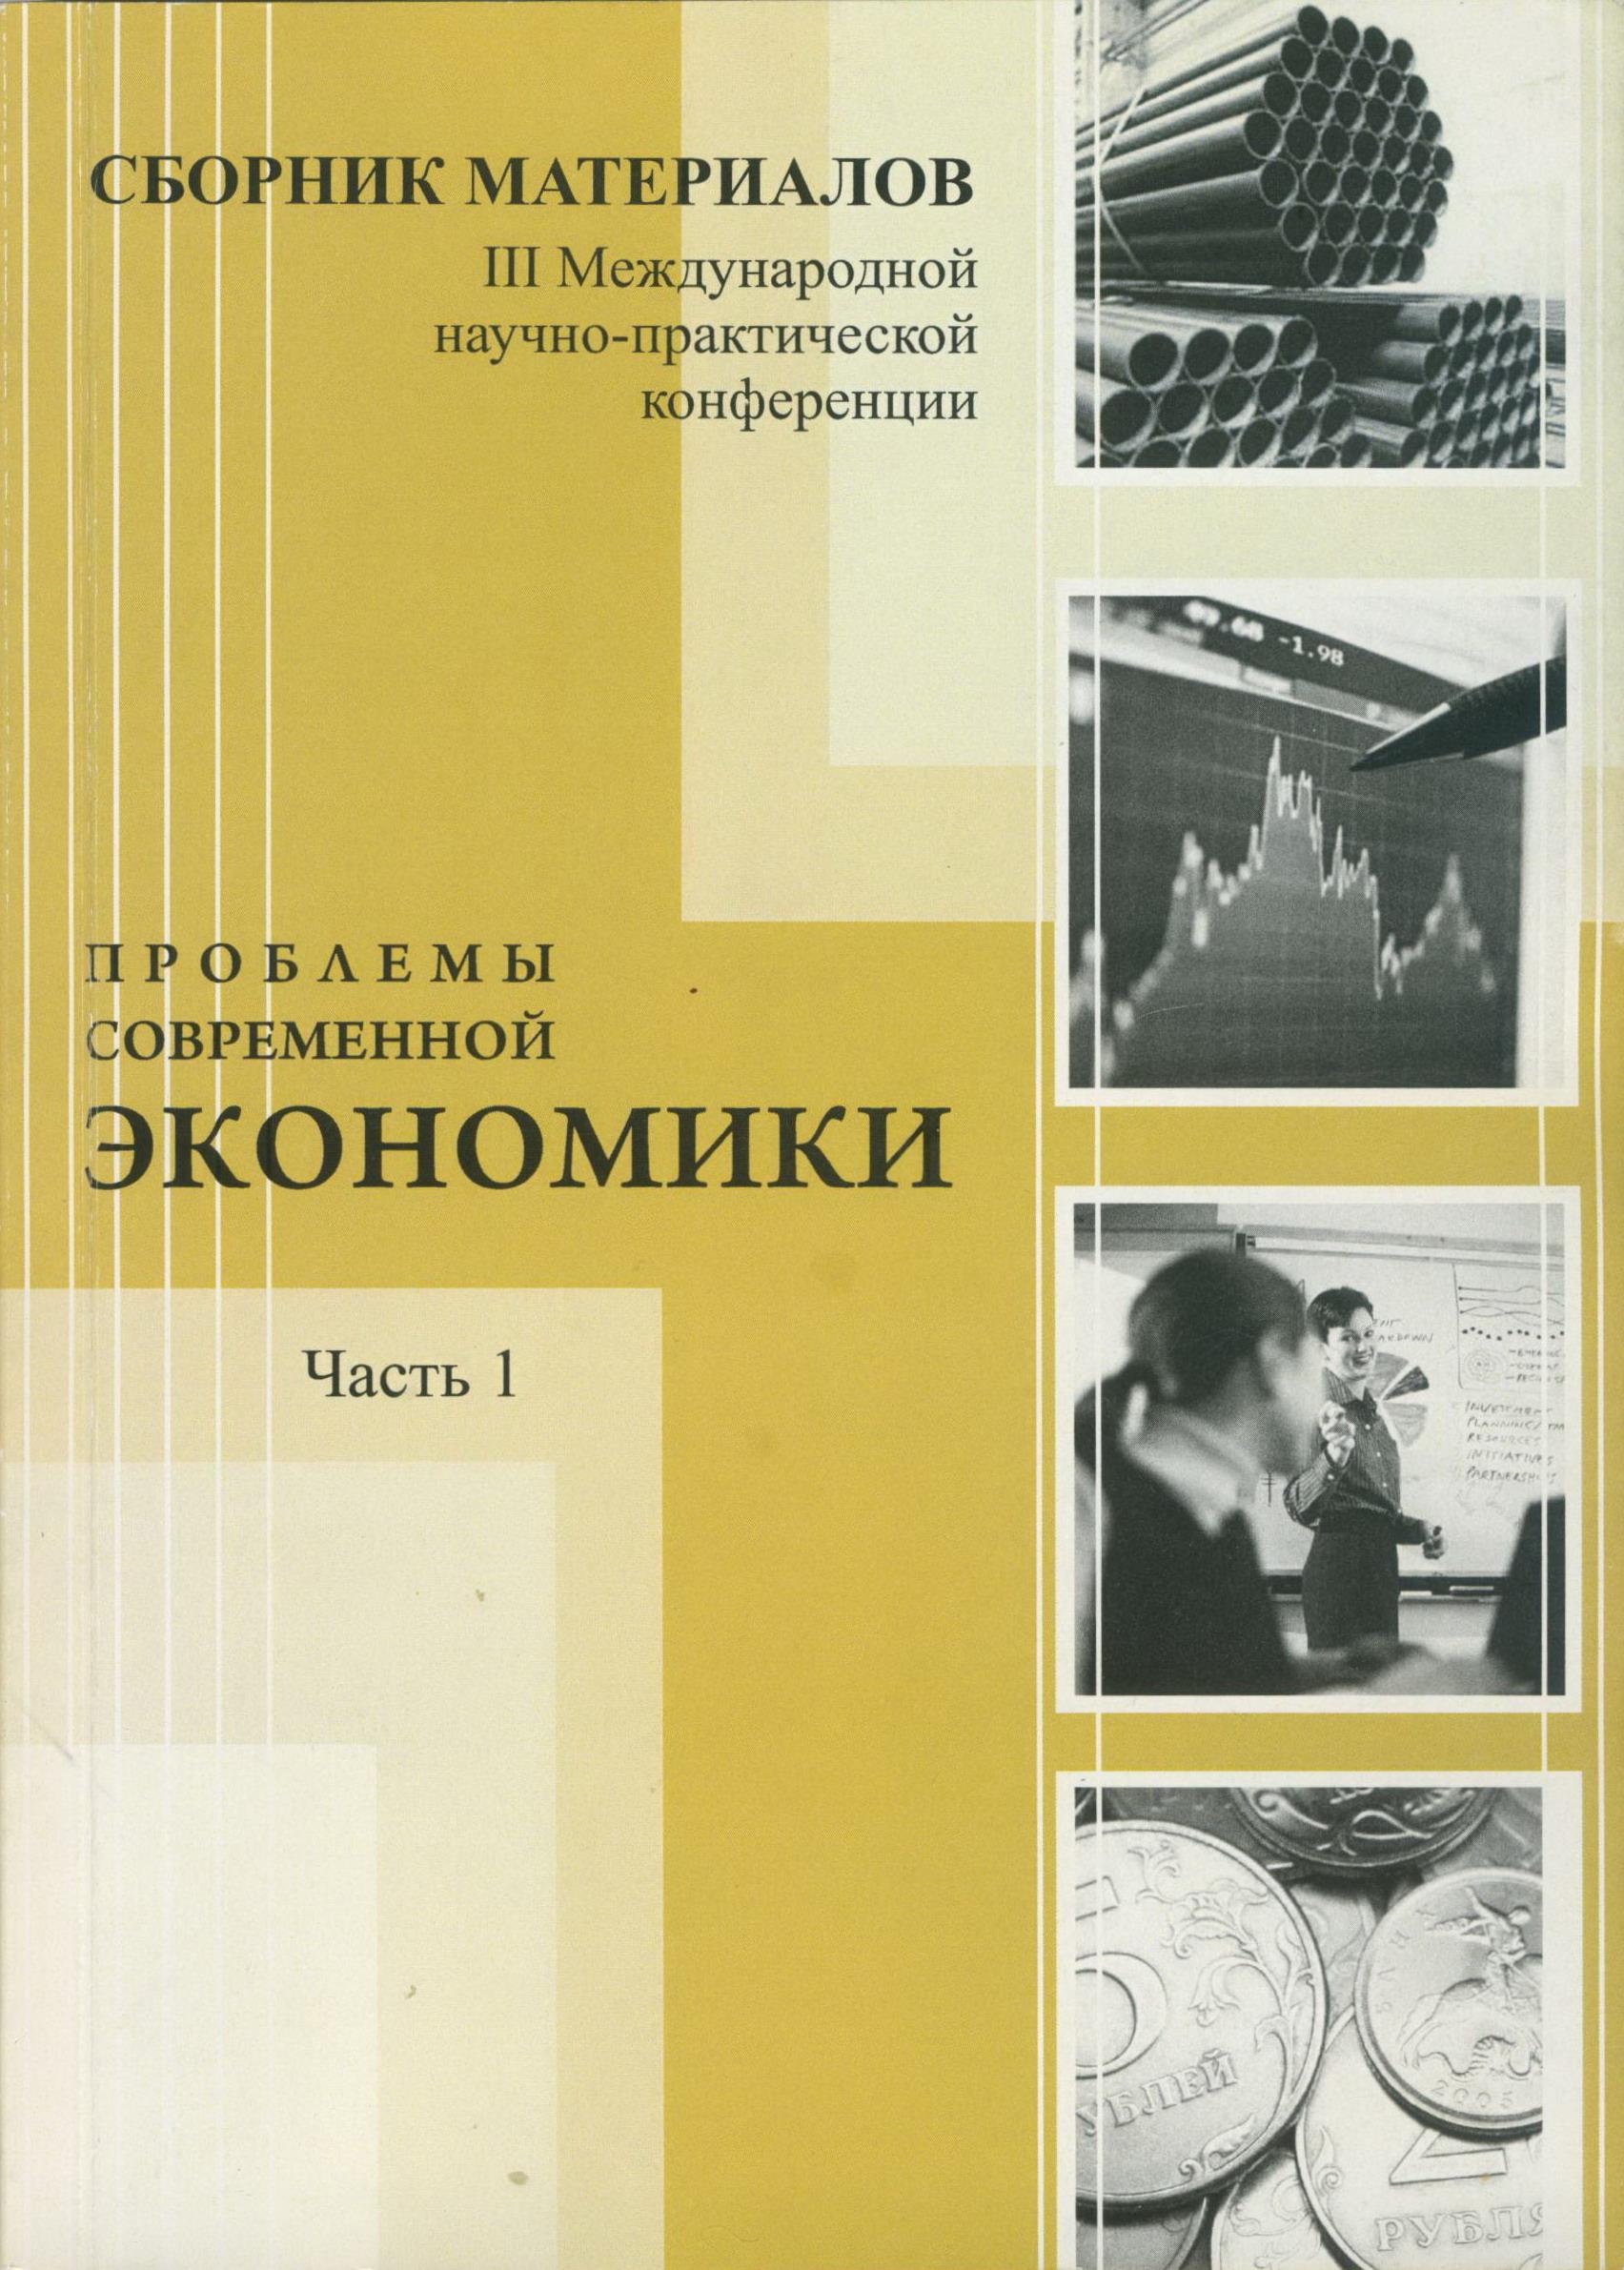 pdf the big book of girl stuff the hip handbook for girls